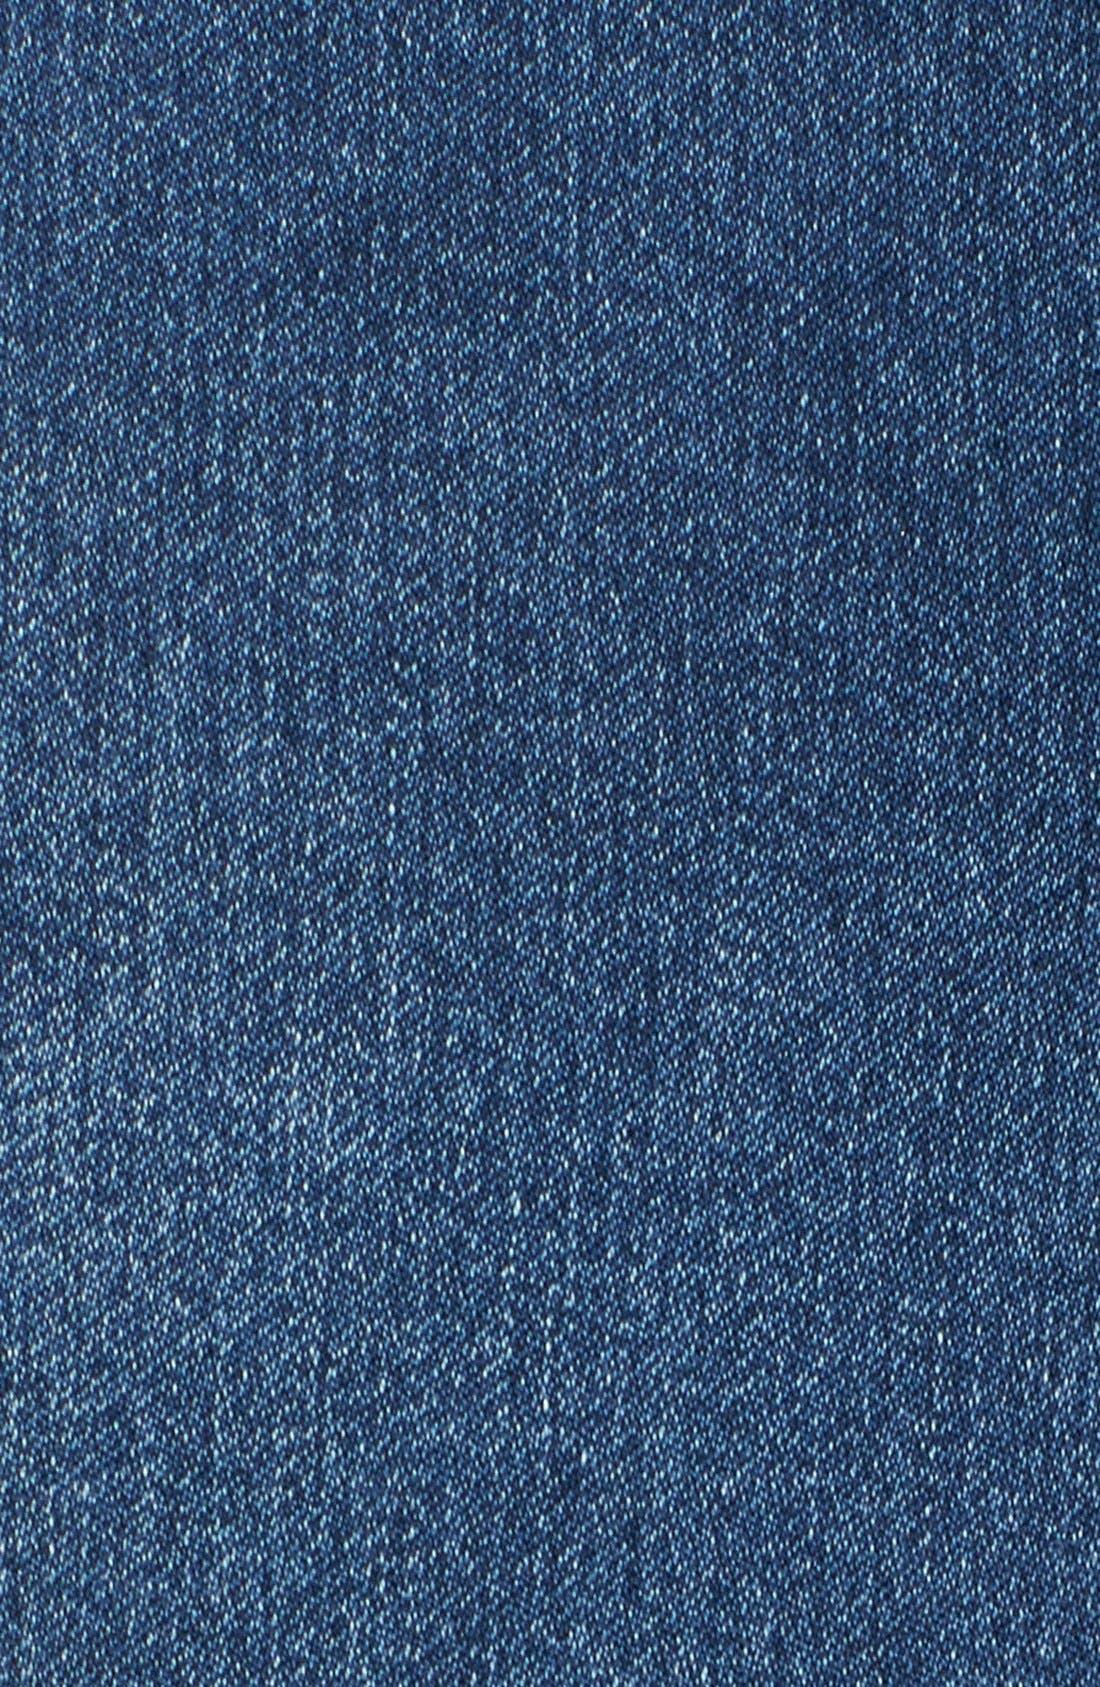 NYDJ, 'Alina' Stretch Skinny Jeans, Alternate thumbnail 5, color, 461